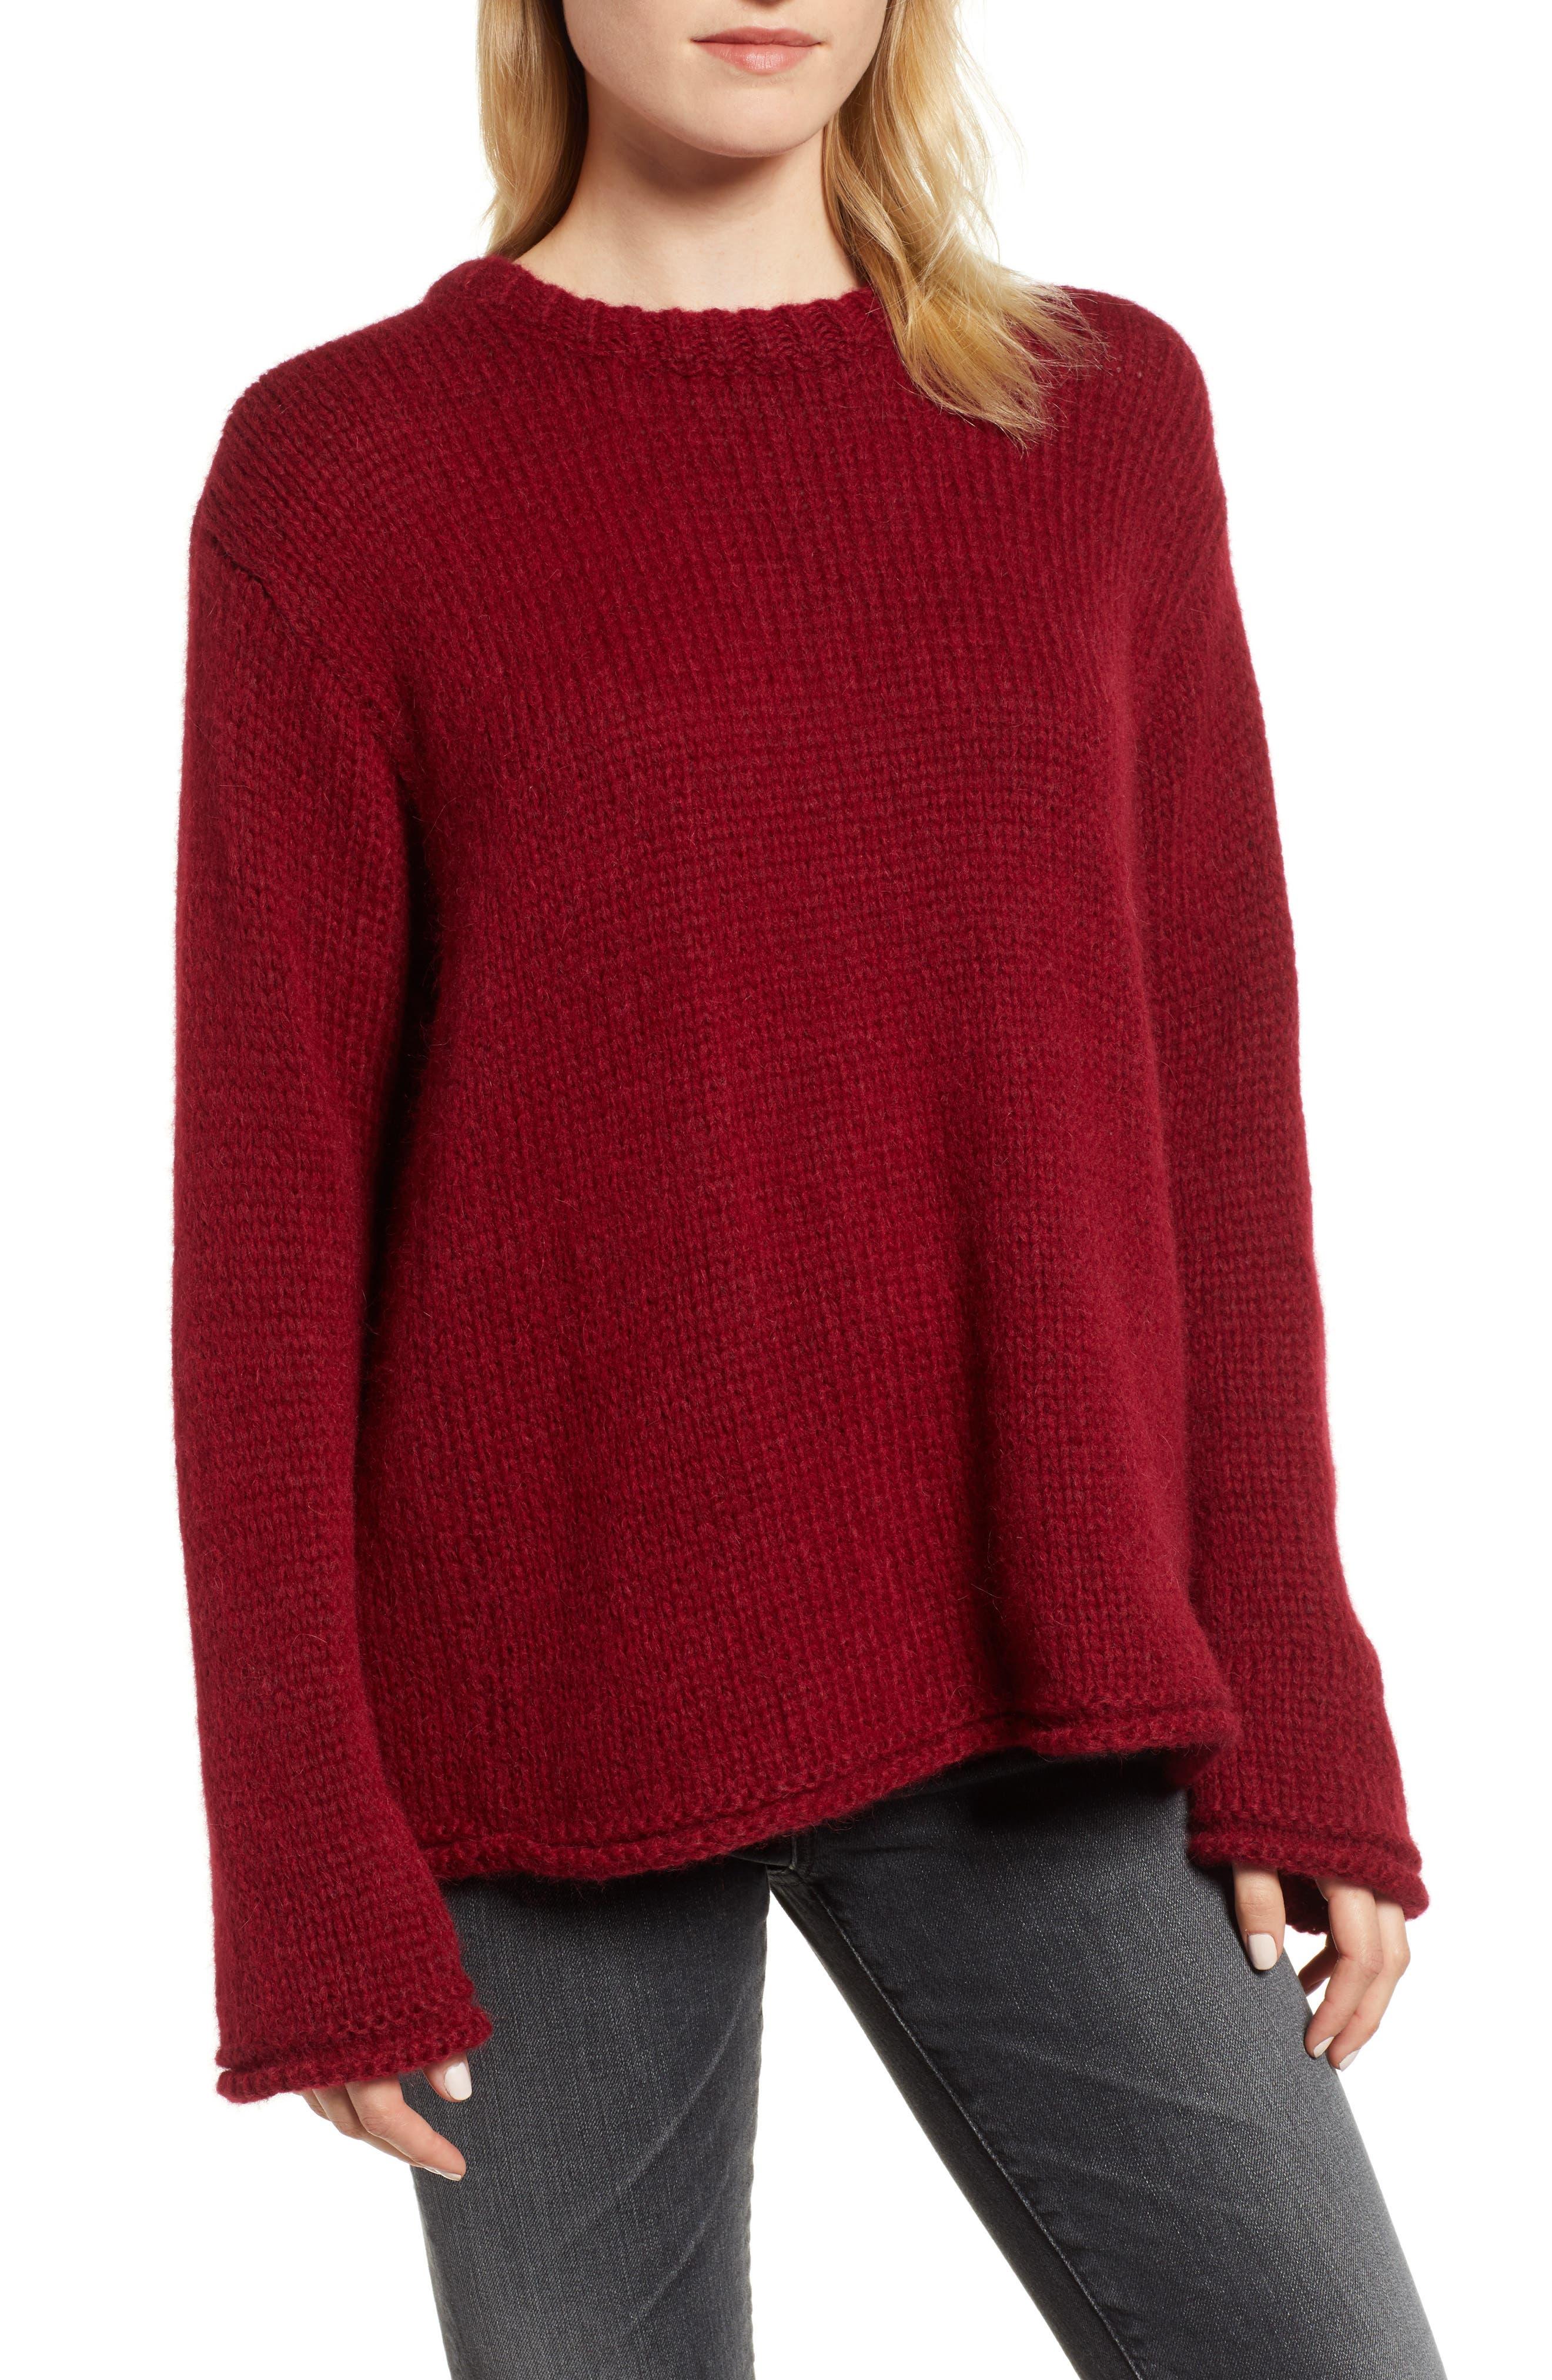 Wool Alpaca Blend Crewneck Sweater,                             Main thumbnail 1, color,                             WINE